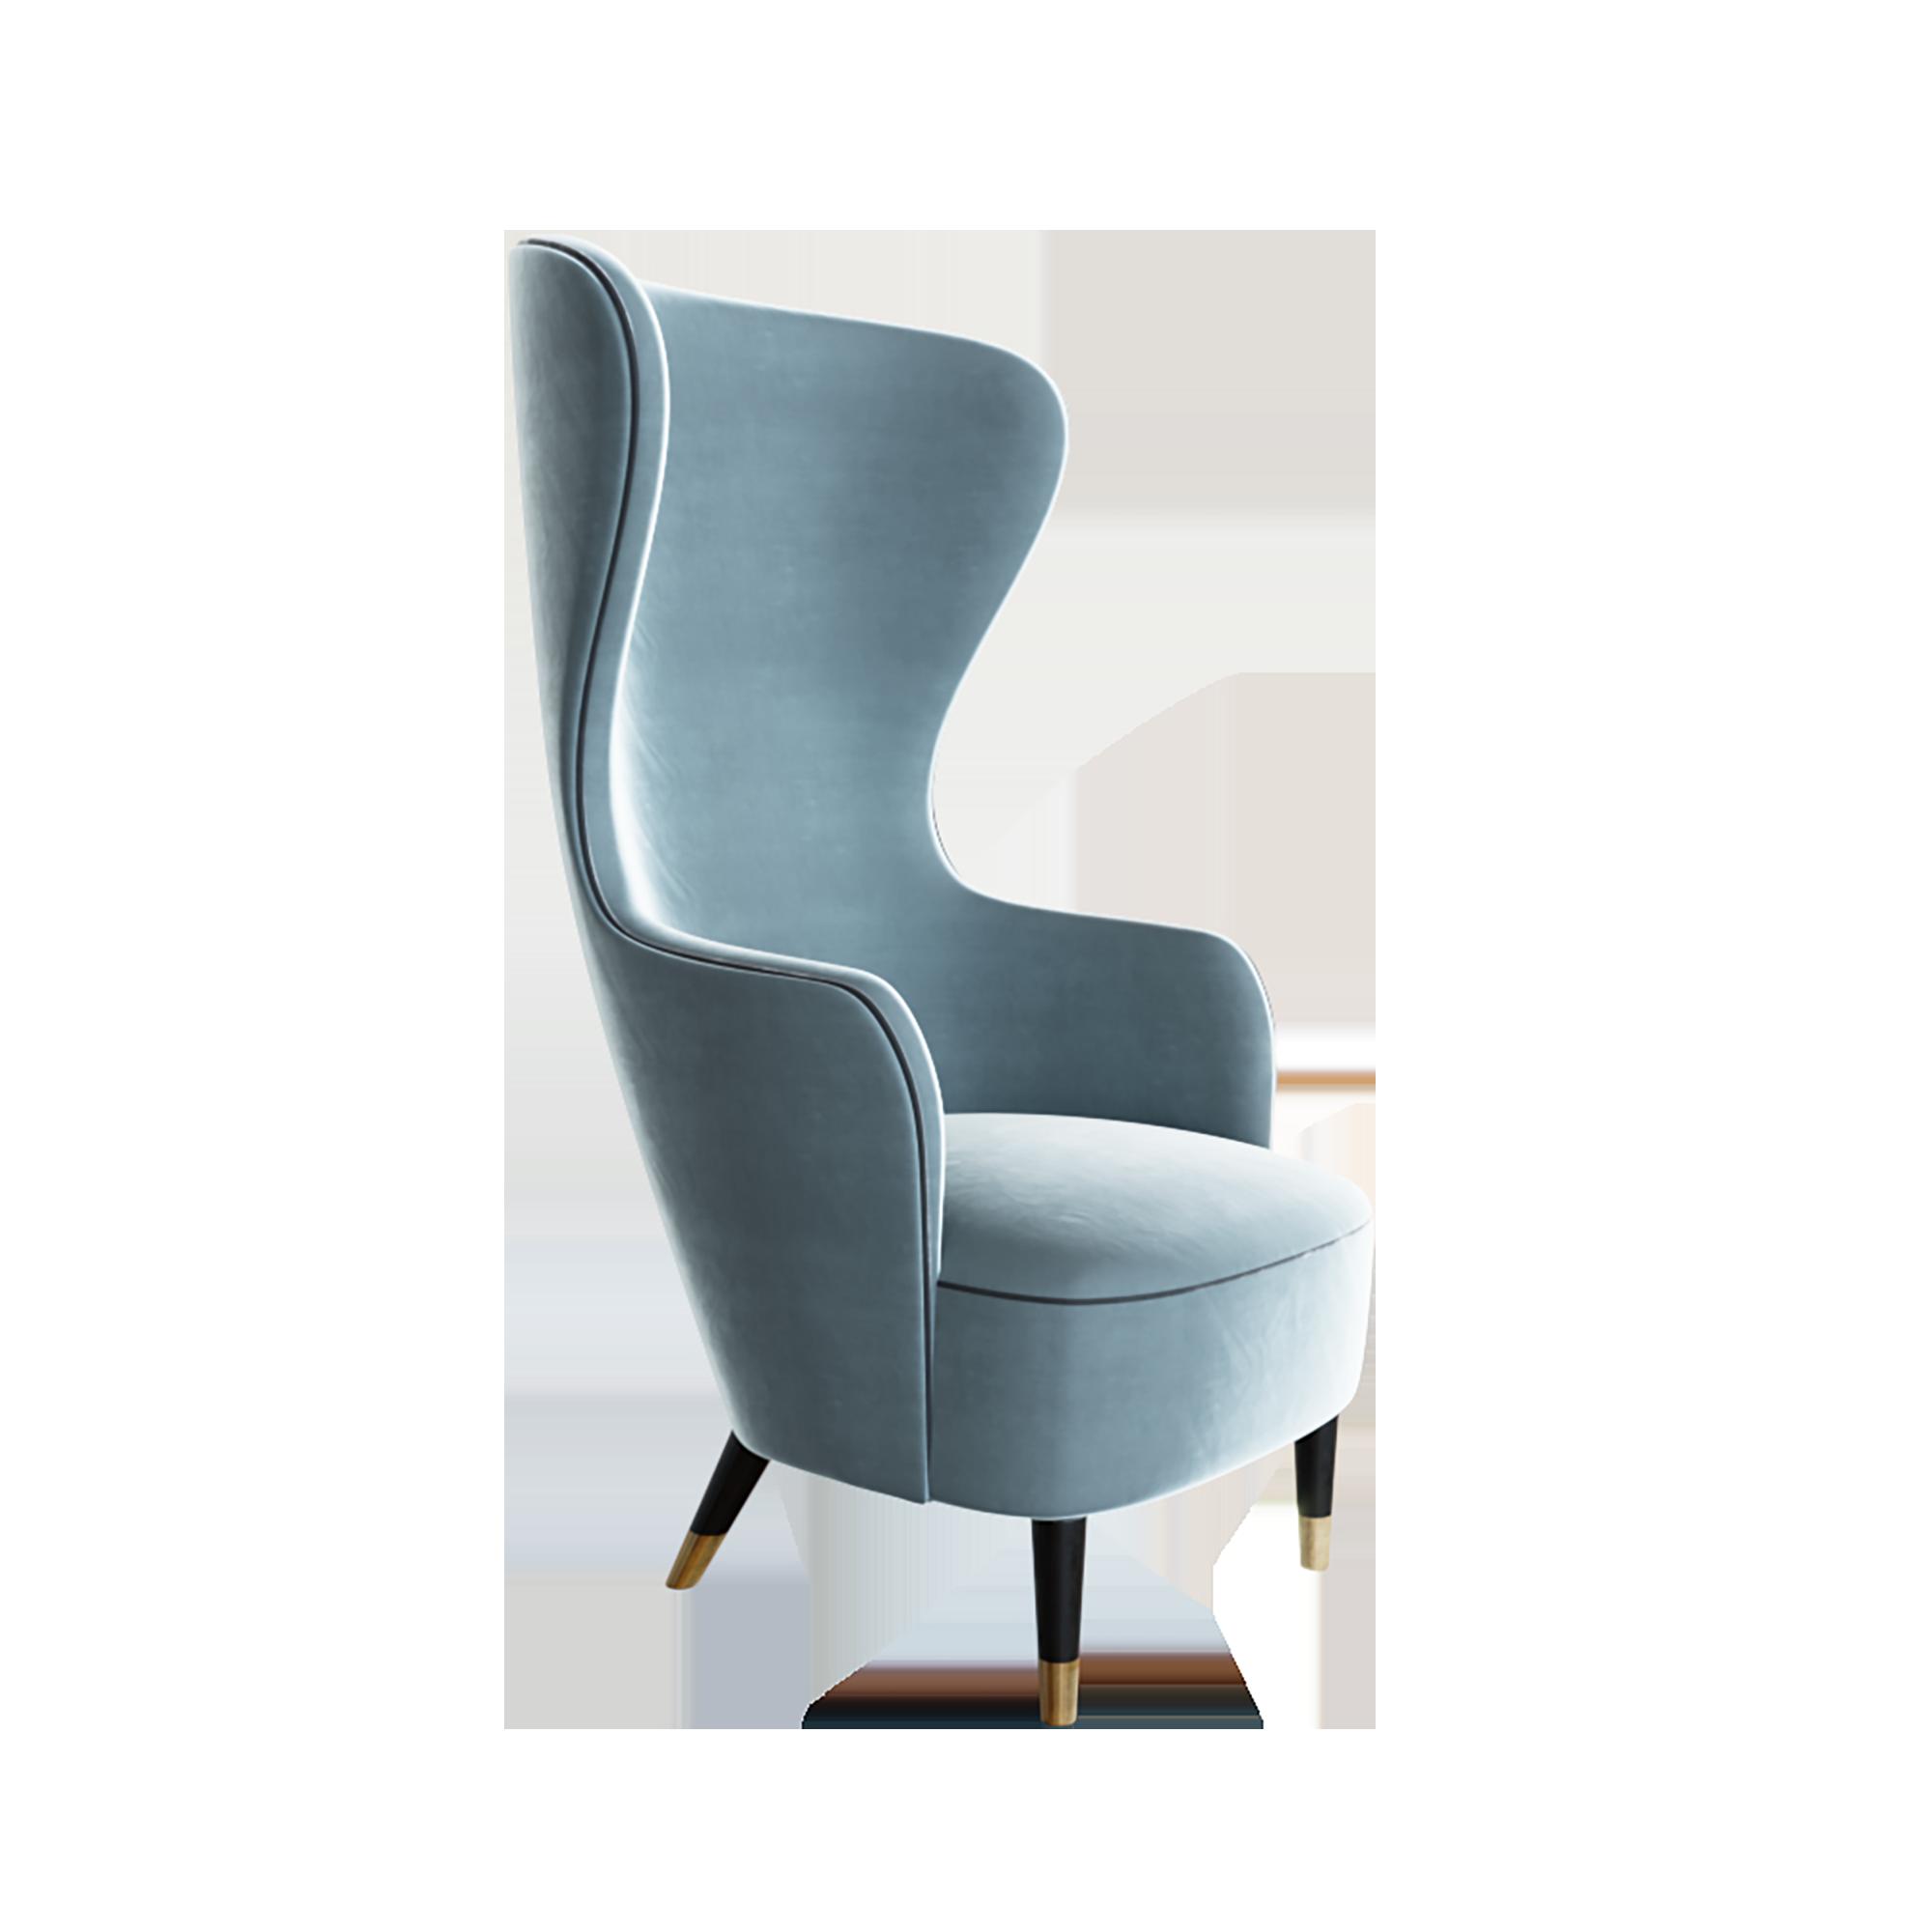 Кресло V002 Any-Home - v002 | AnyHome.ru